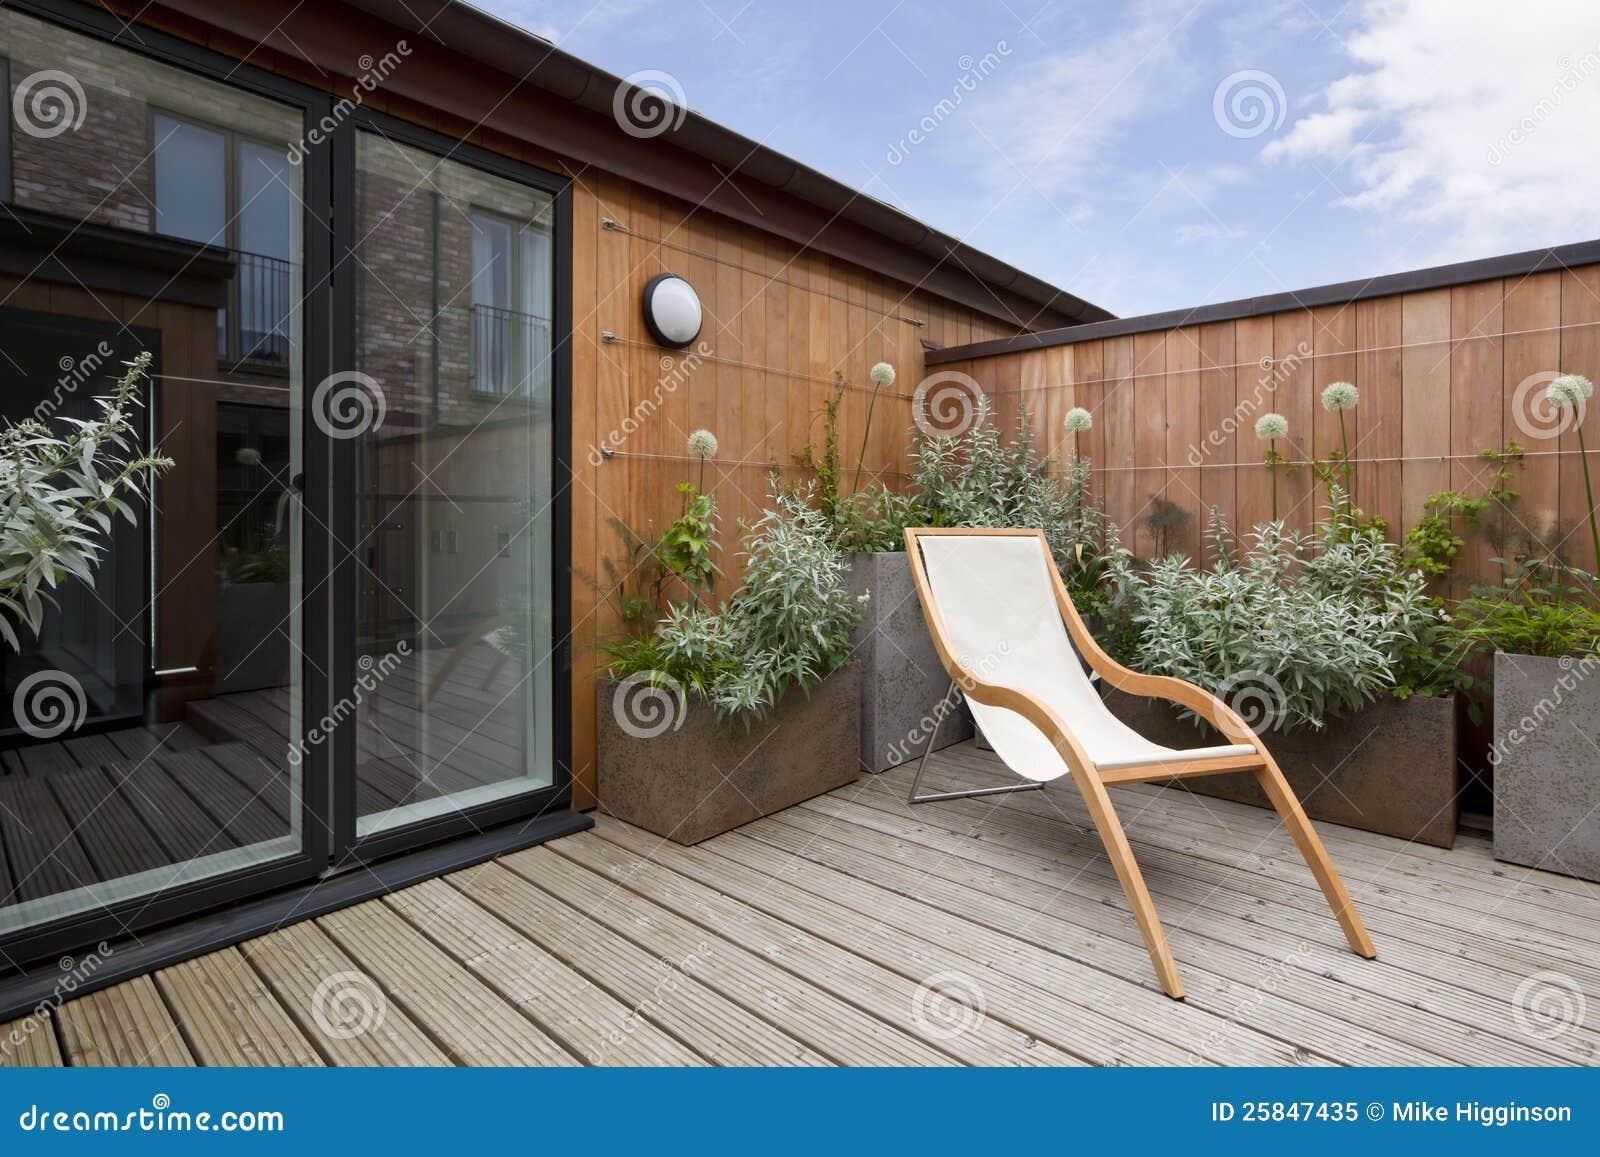 Jardin urbain de balcon photo libre de droits image for Jardin urbain moderne